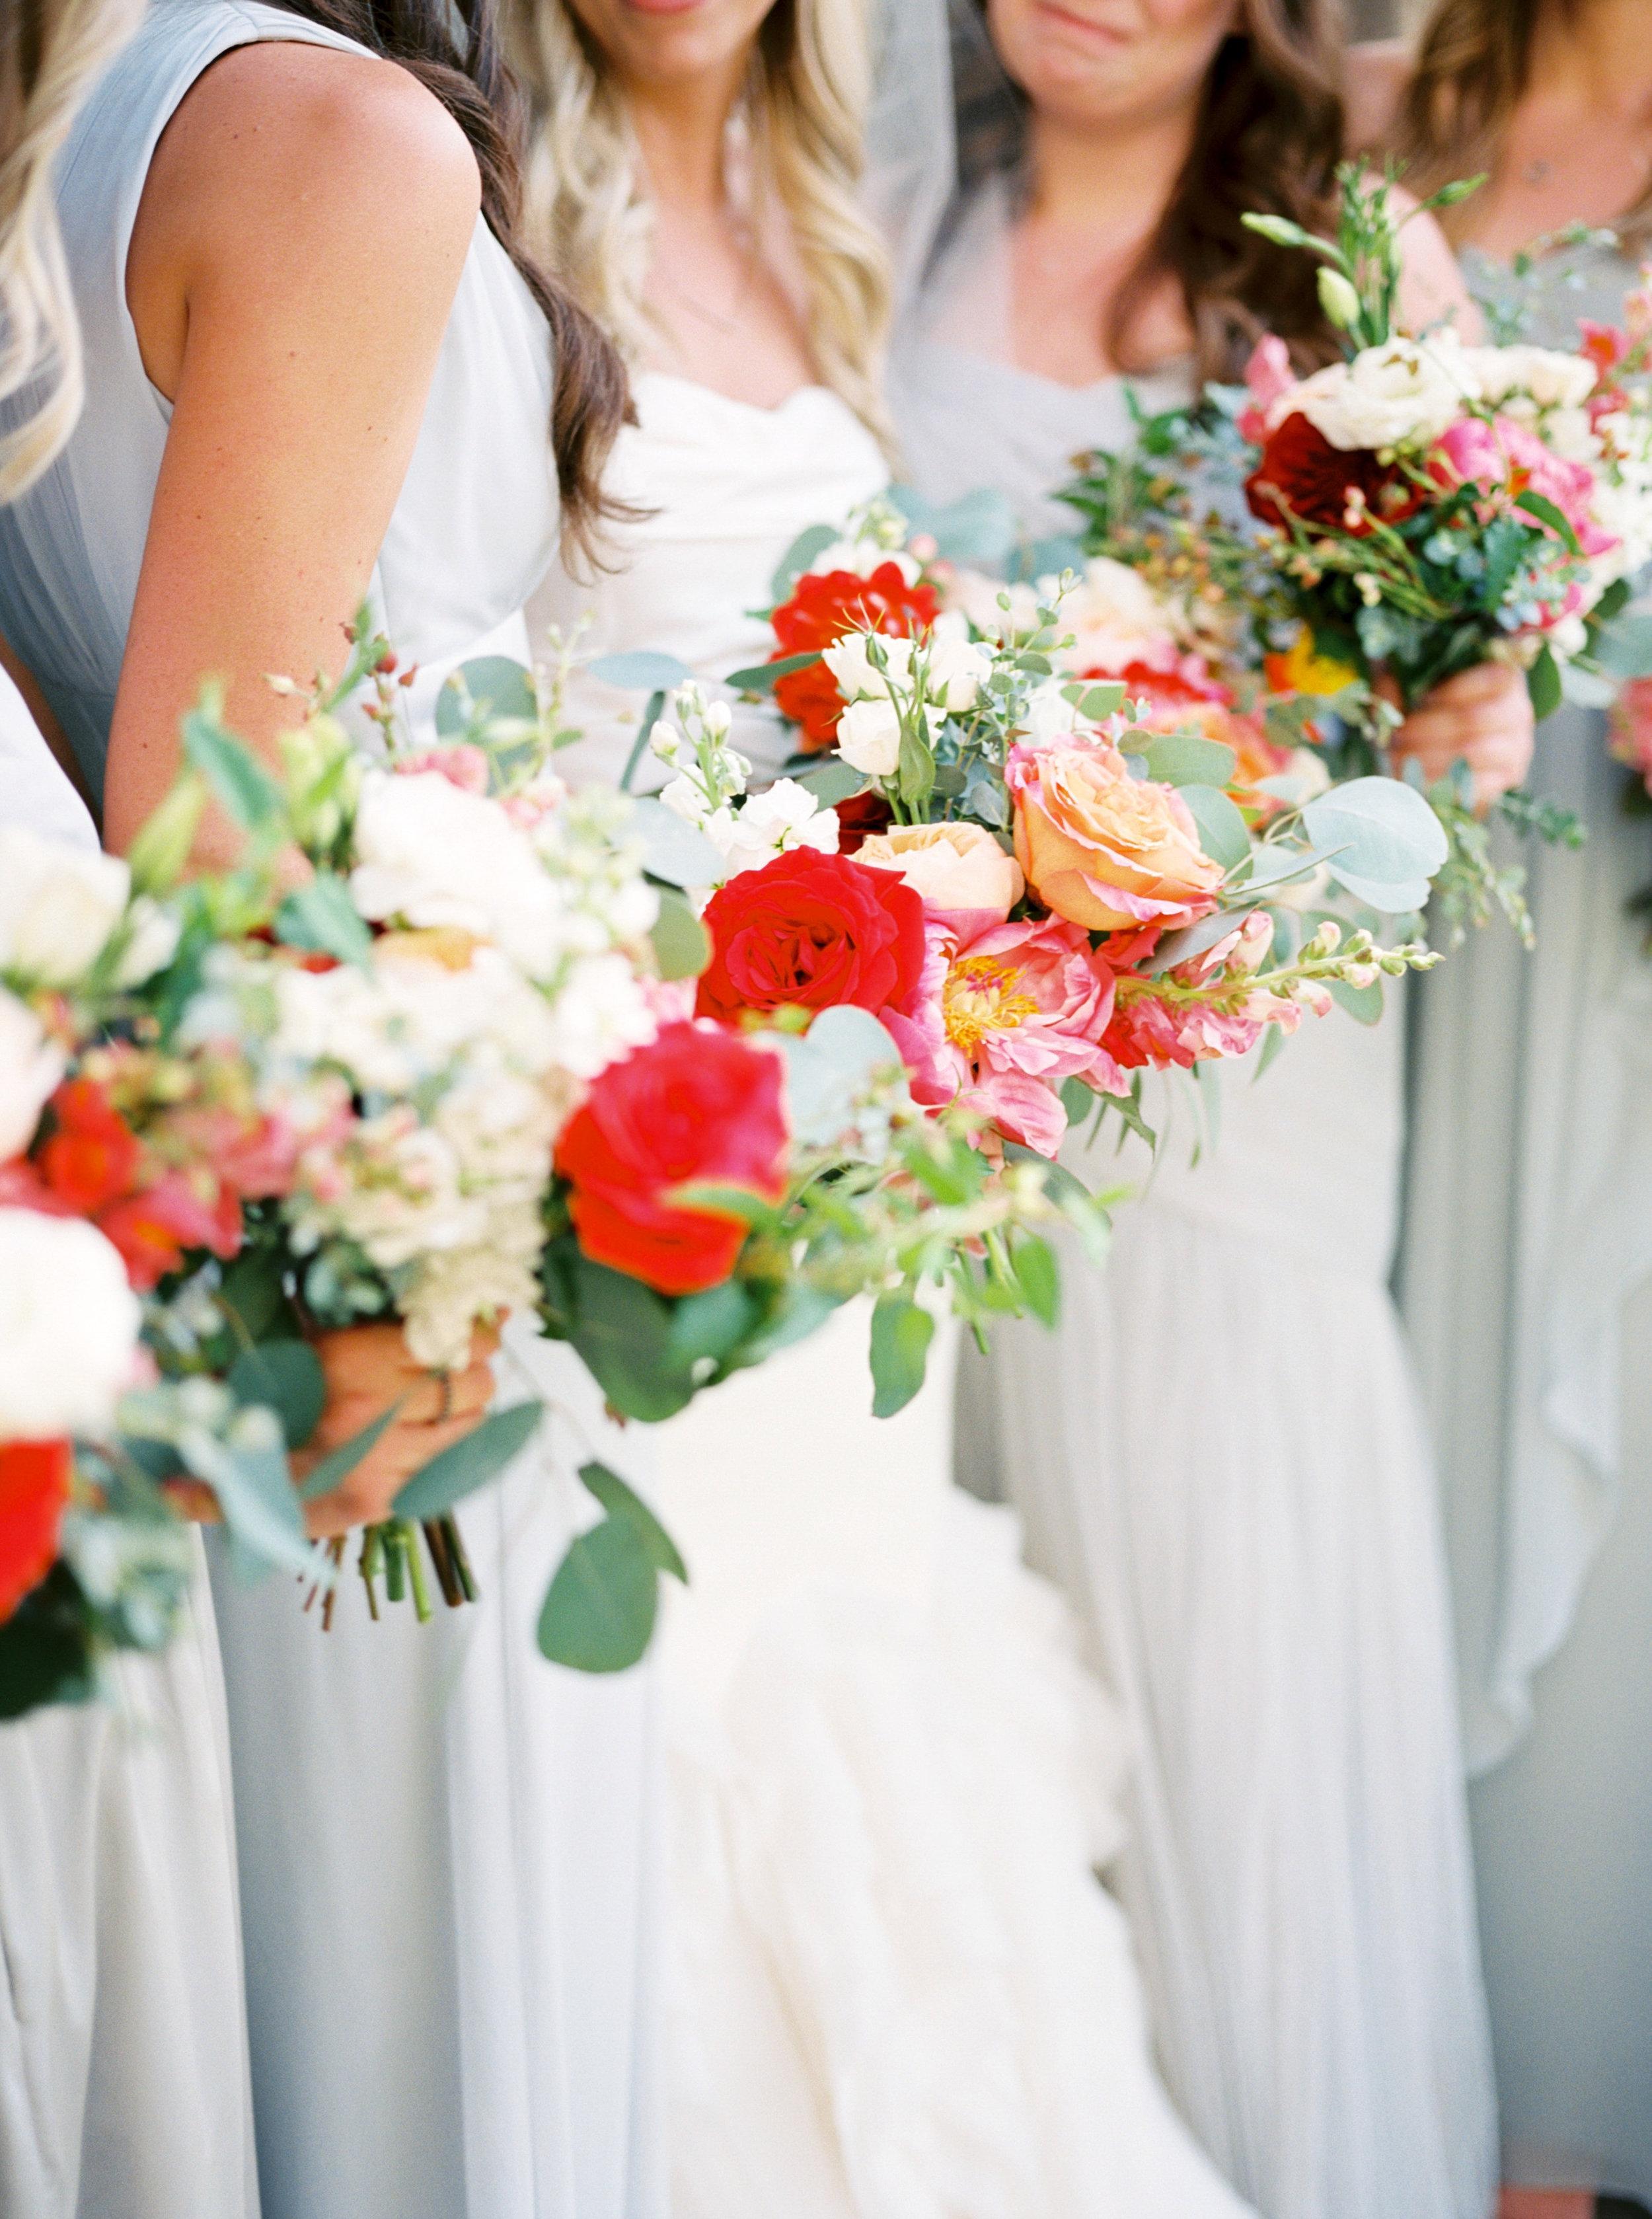 Bride details, garden bridal bouquet, bridal bouquet, coral wedding flowers, orange wedding flowers, blush wedding flowers, pink wedding flowers, wedding dress, Vera Wang wedding dress, grey bridesmaids dress, bridesmaid dress